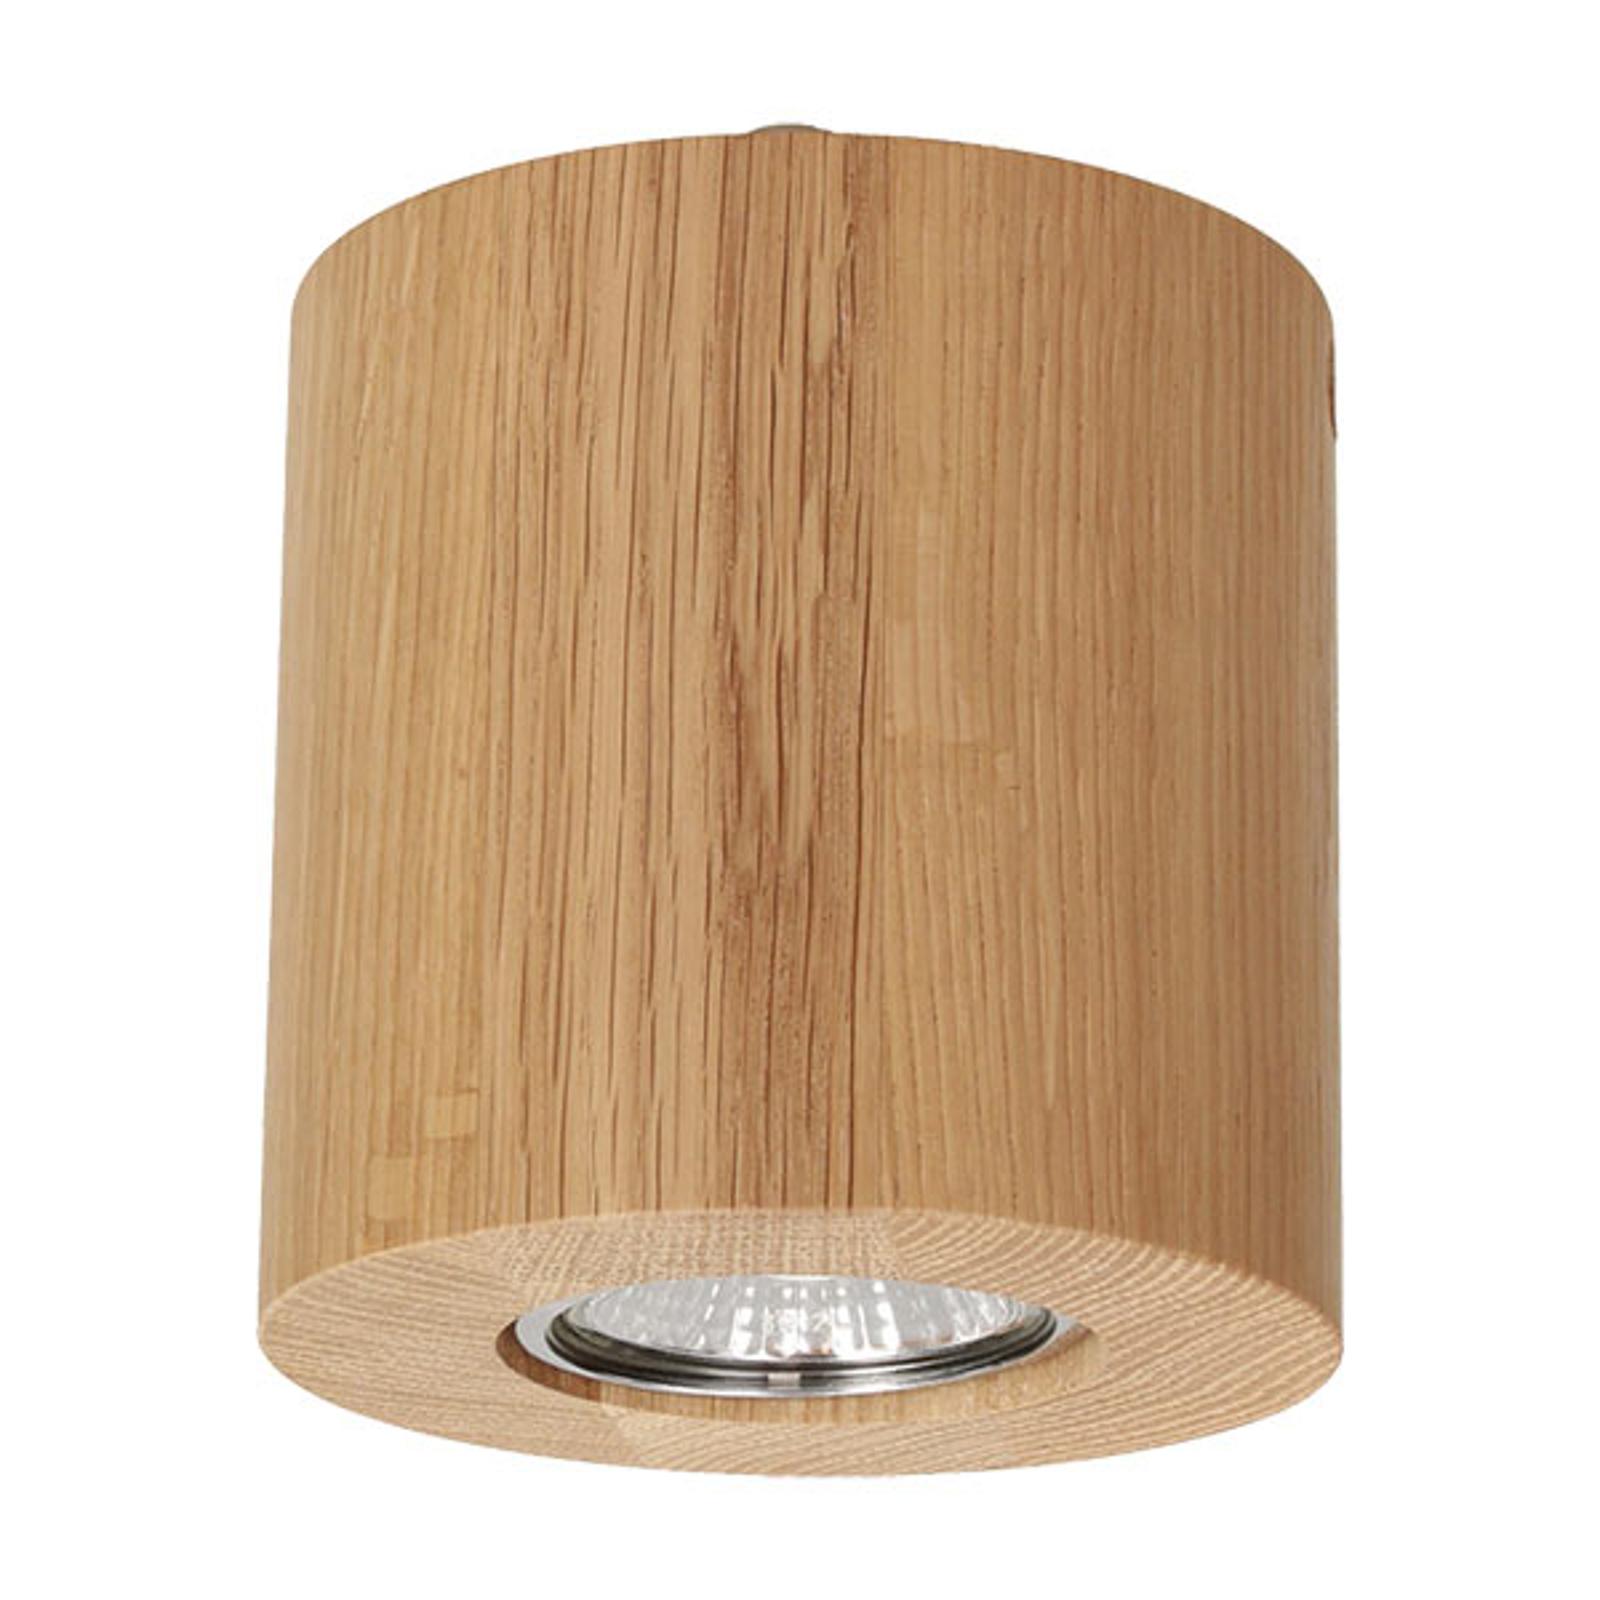 Plafonnier Wooddream à 1 lampe, chêne, rond